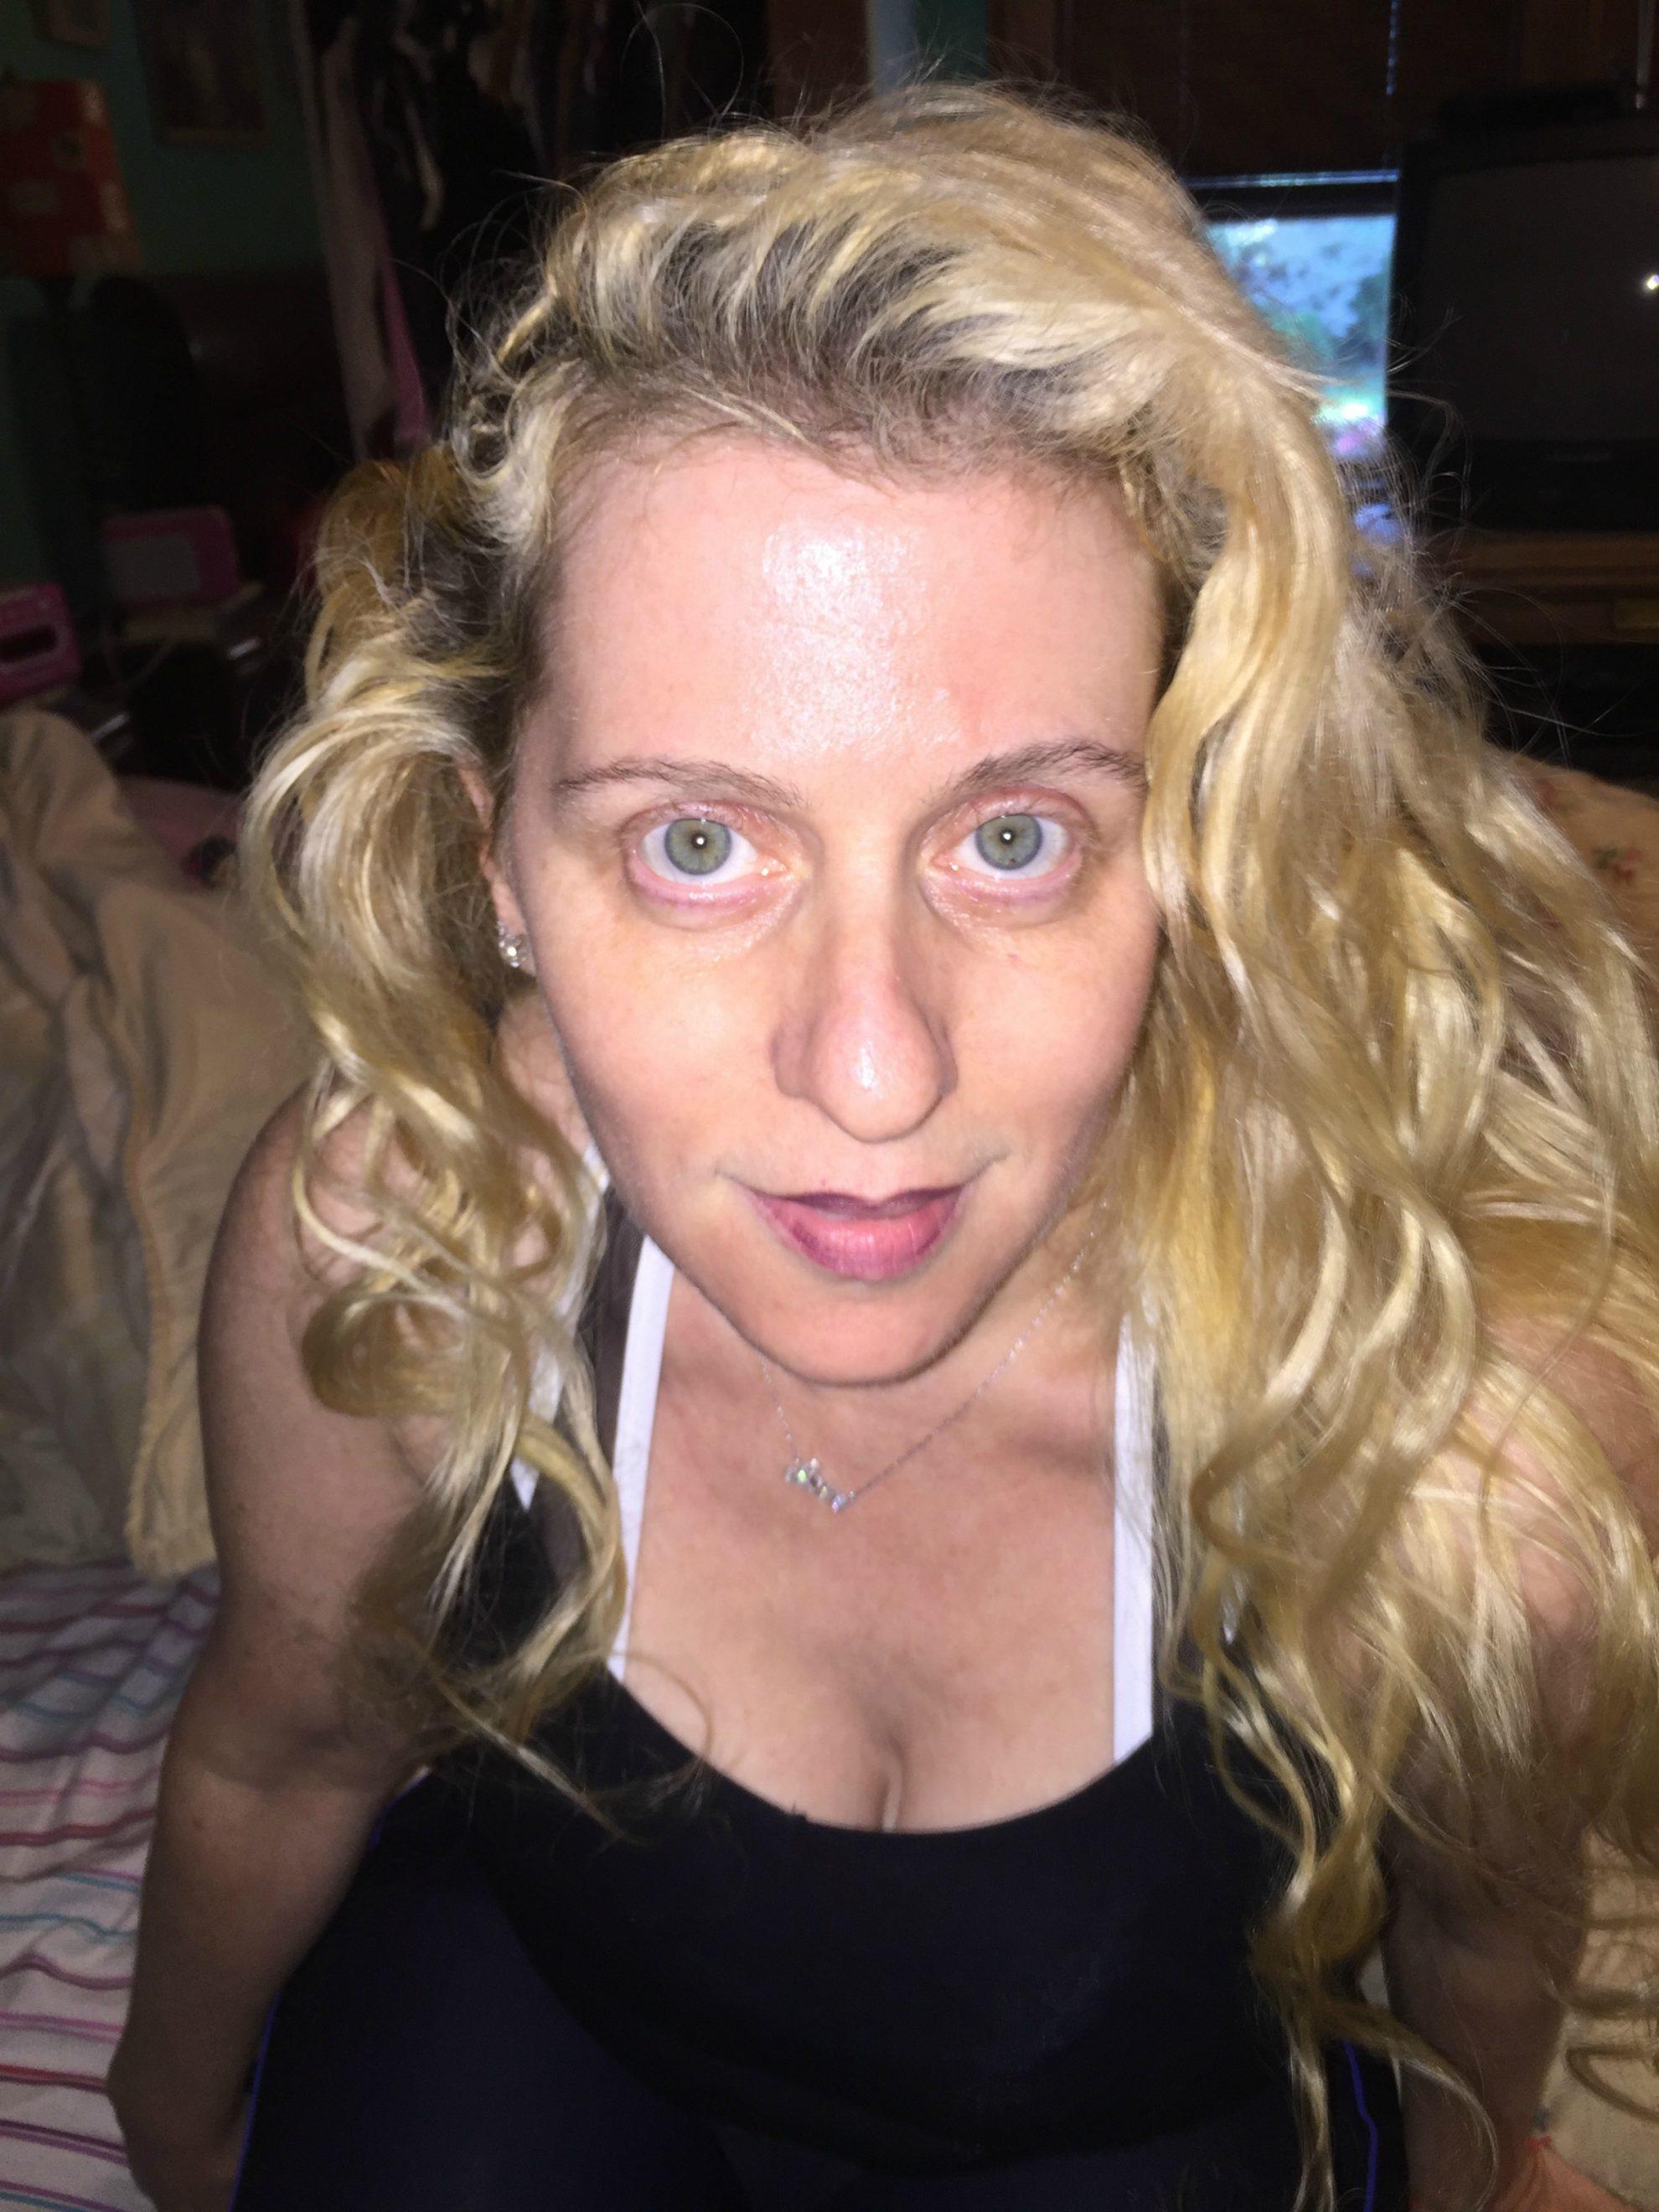 Day three of my Neutrogena Rapid Wrinkle Repair photo diary